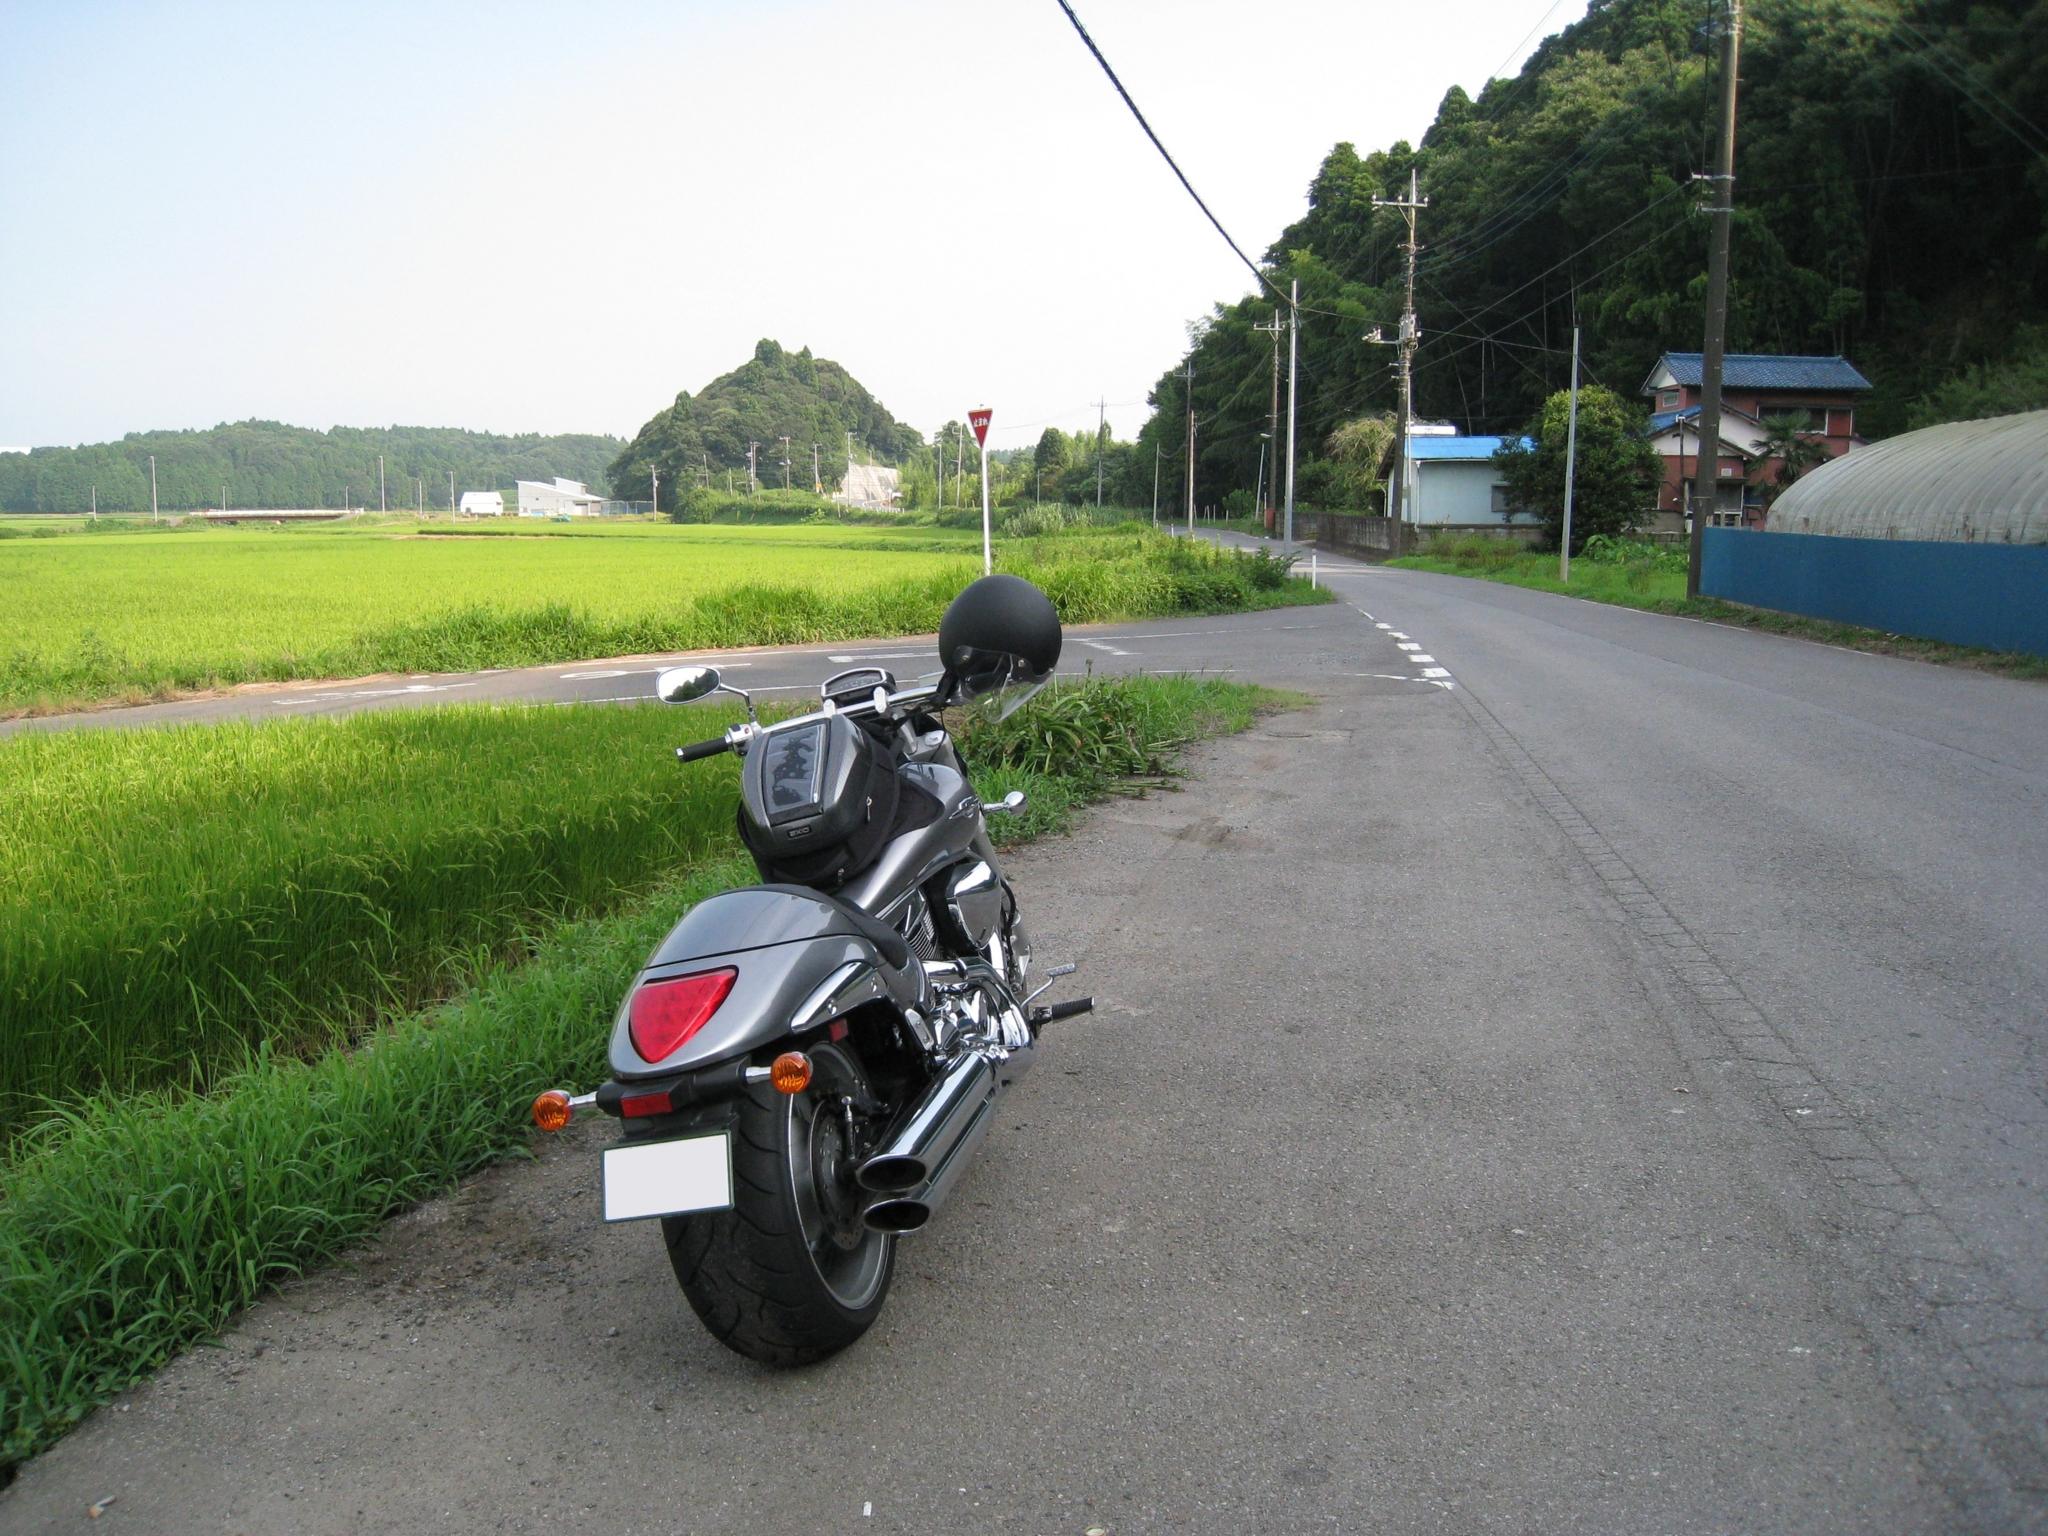 f:id:ToshUeno:20100731155729j:plain